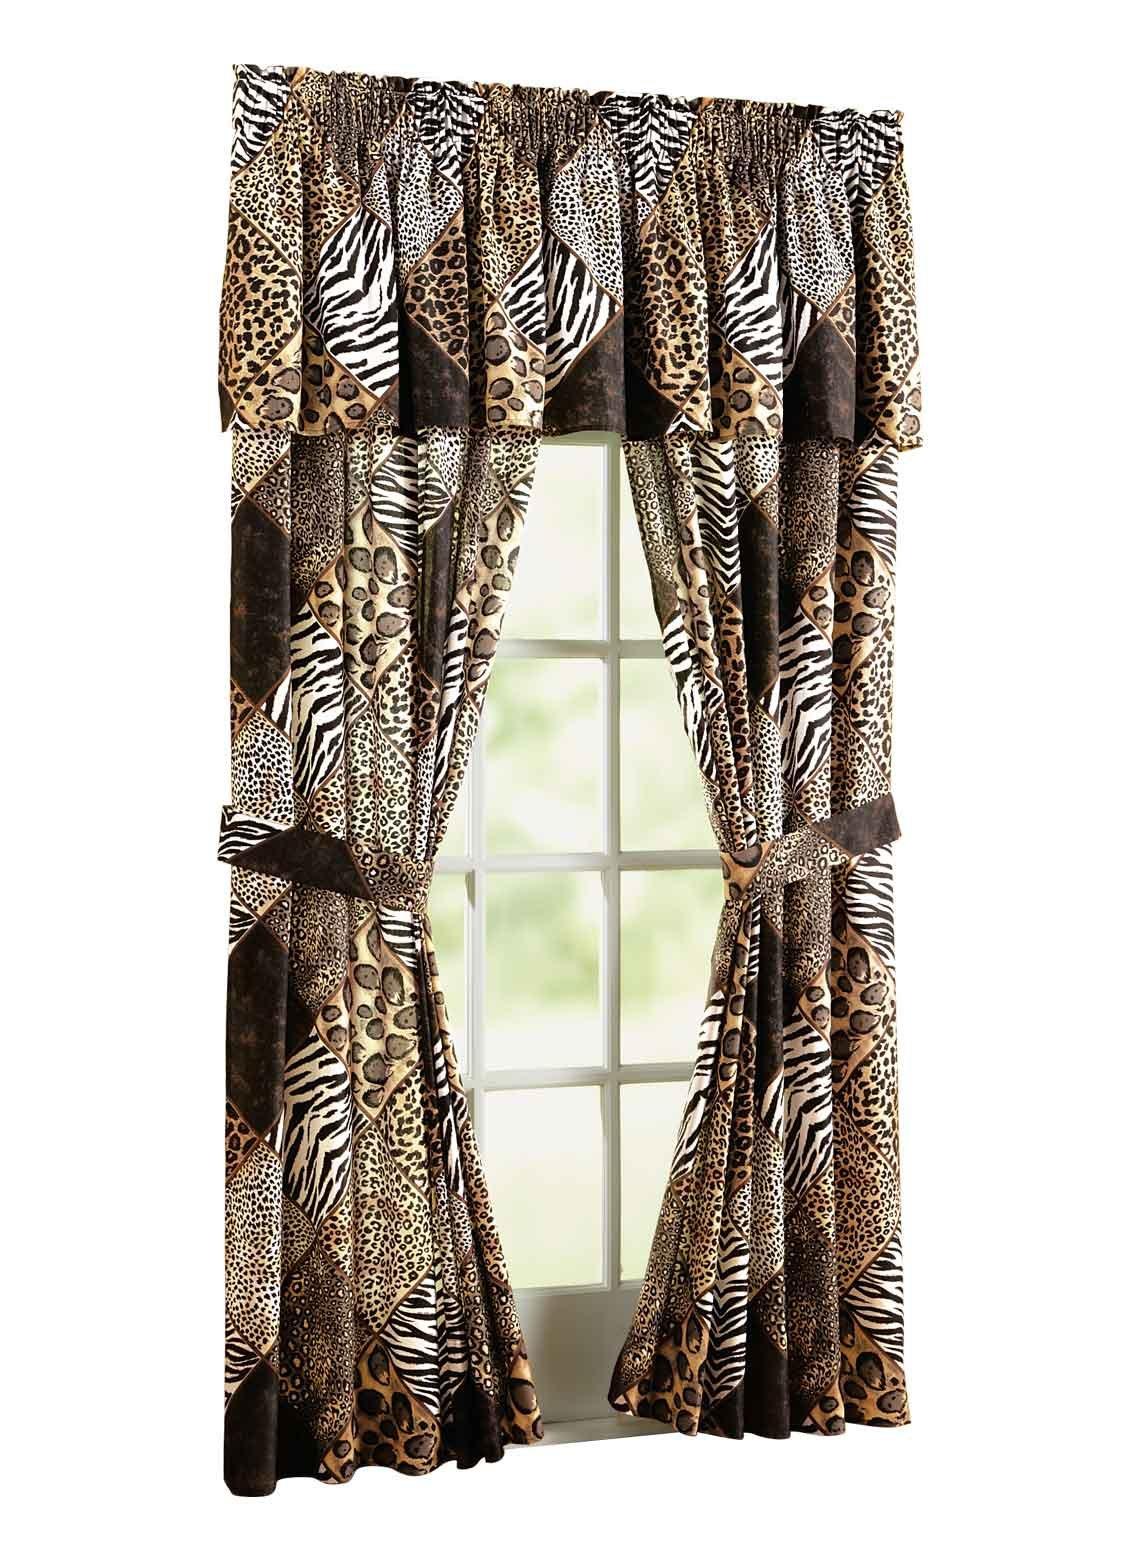 Carol Wright Gifts Safari Bedding Separates - Curtain